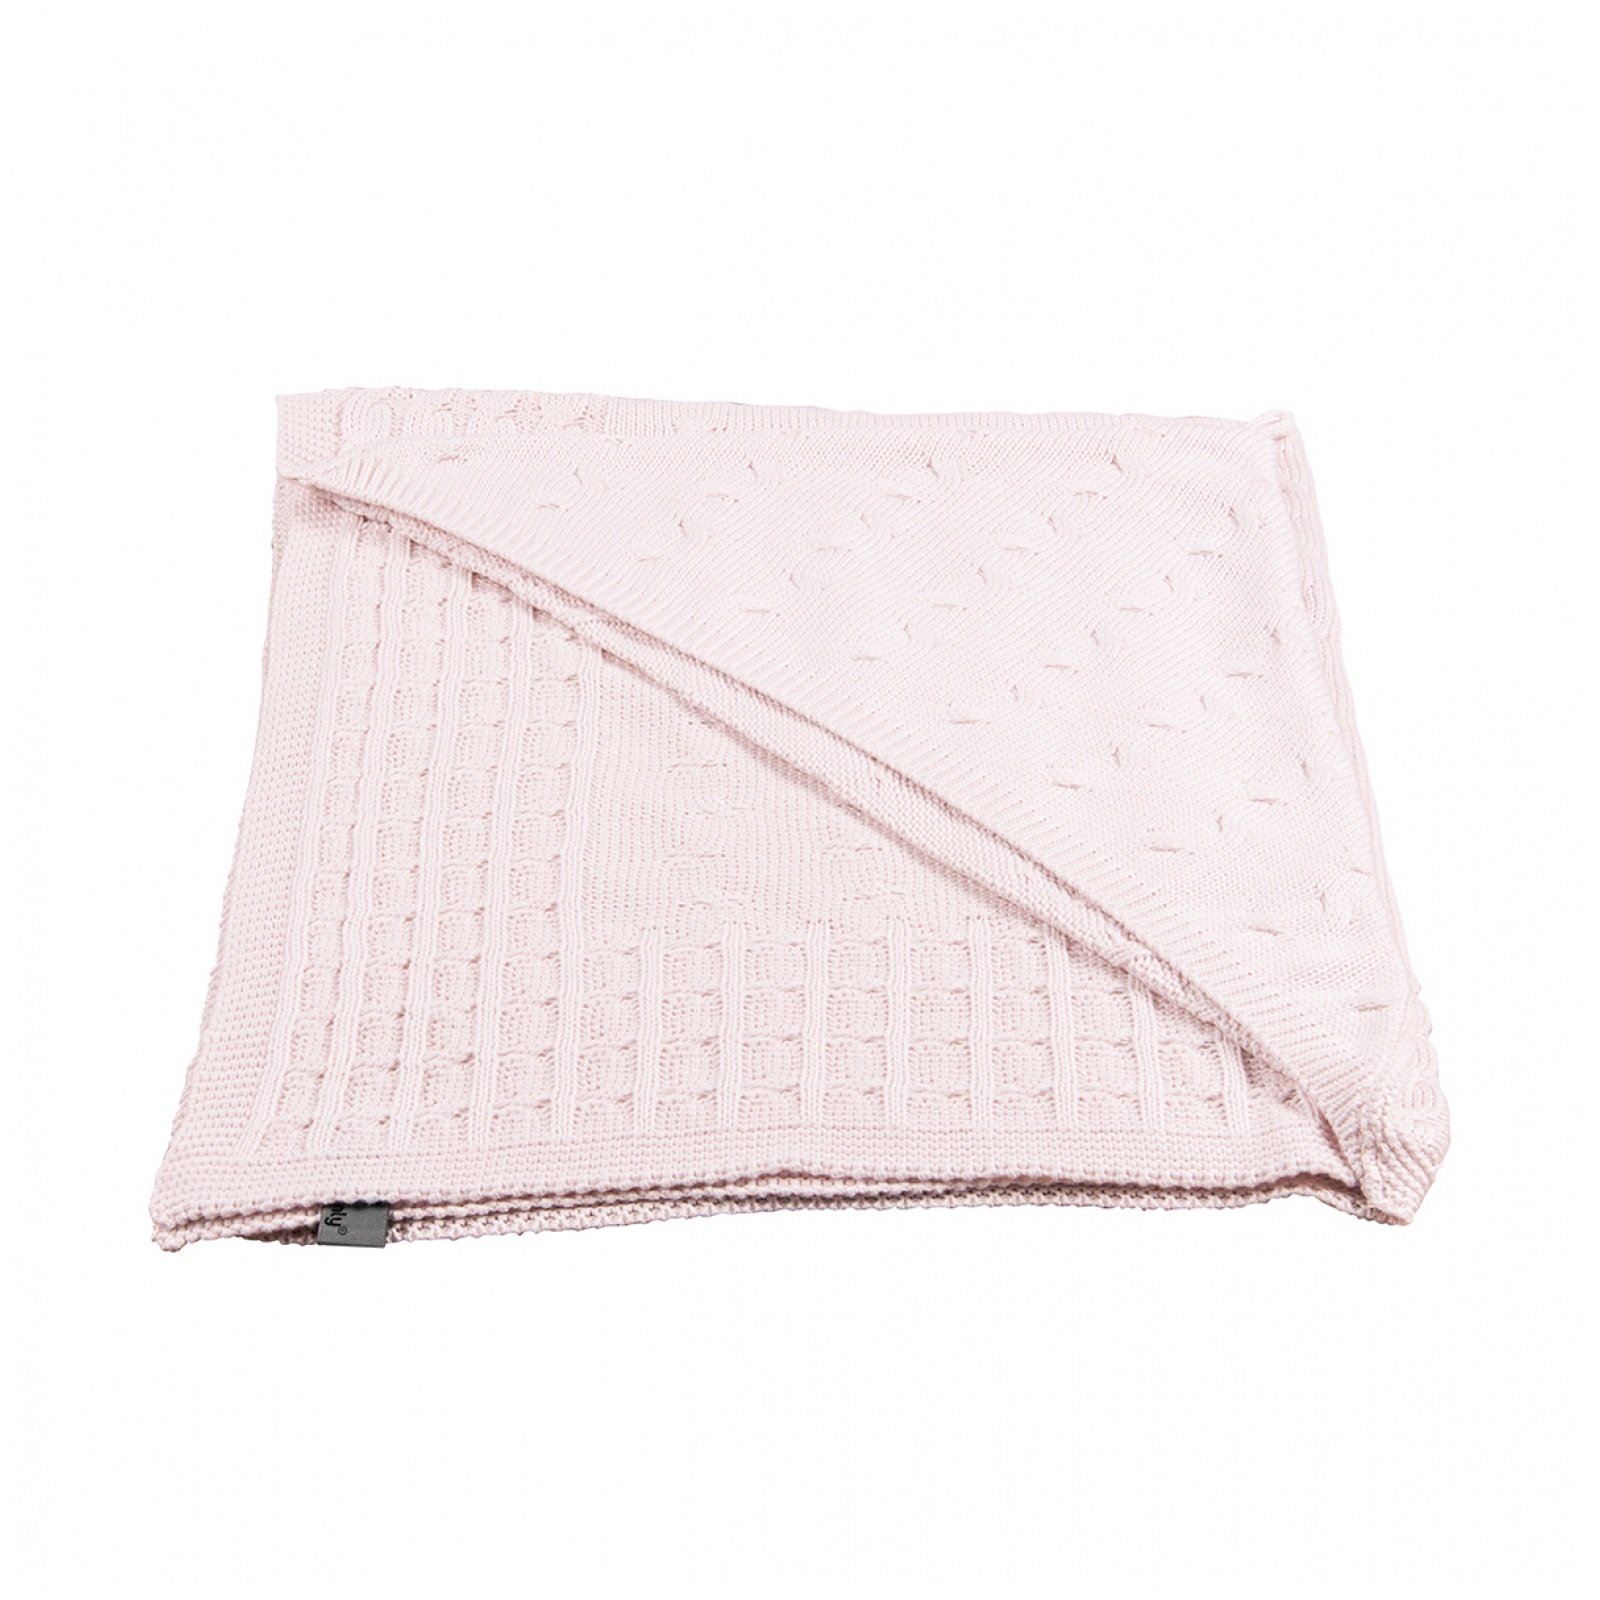 Babydecke Kapuzendecke Zopfstrick rosa (75x75 cm)